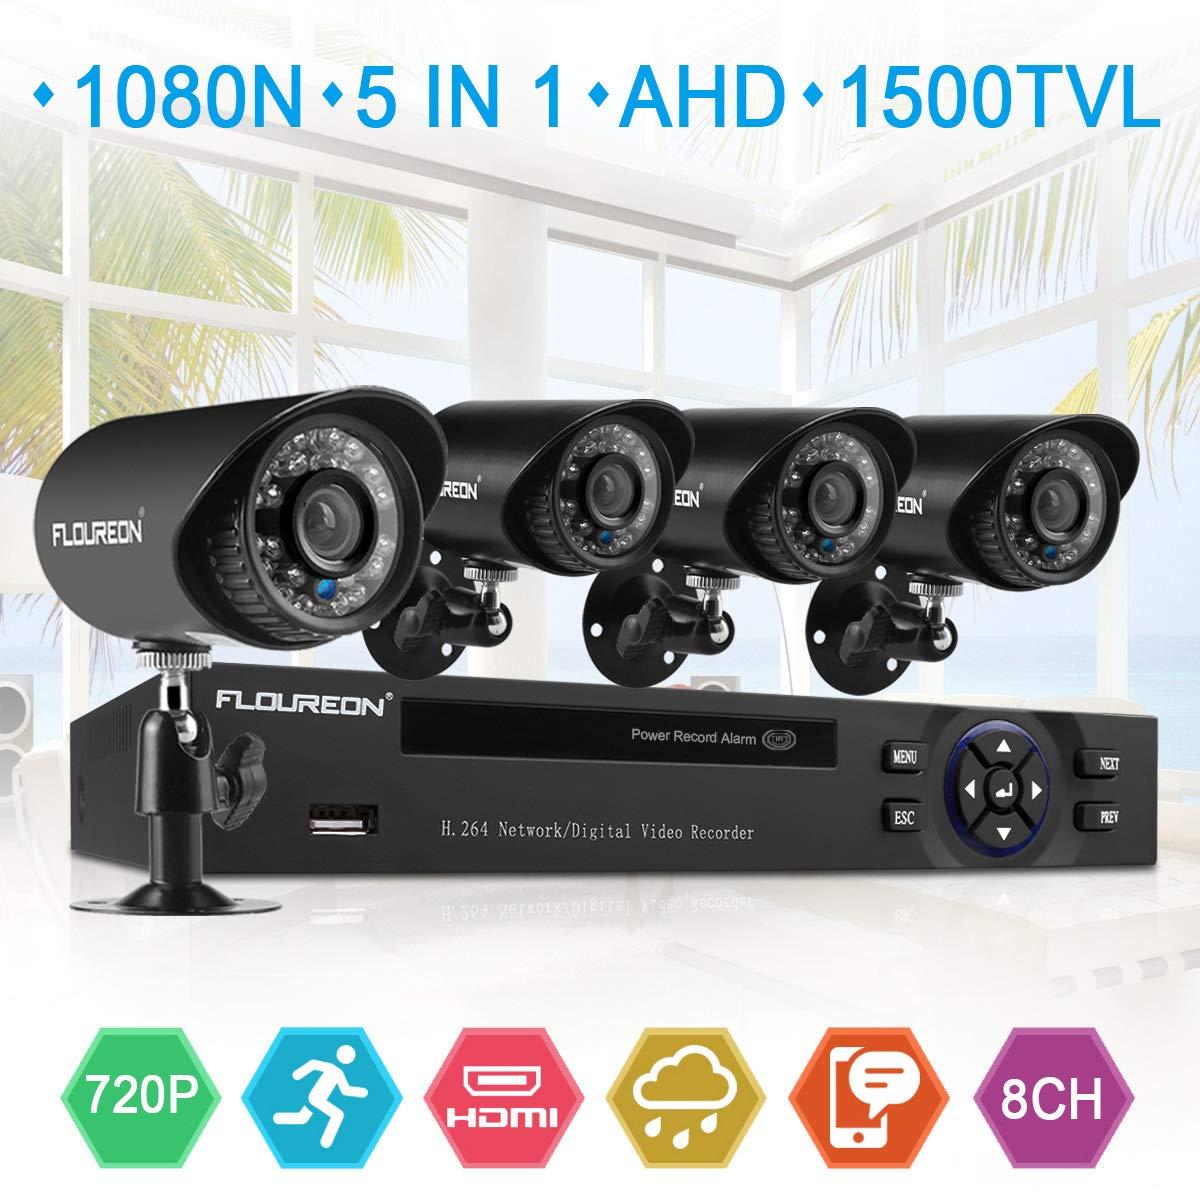 FLOUREON House Security Camera System 1080N DVR + 4 Pack 1.0MP CMOS Lens CCTV Security Camera 1500TVL Night Vision Remote Access Motion Detection (8CH+ 4X 1500TVL Camera) by floureon